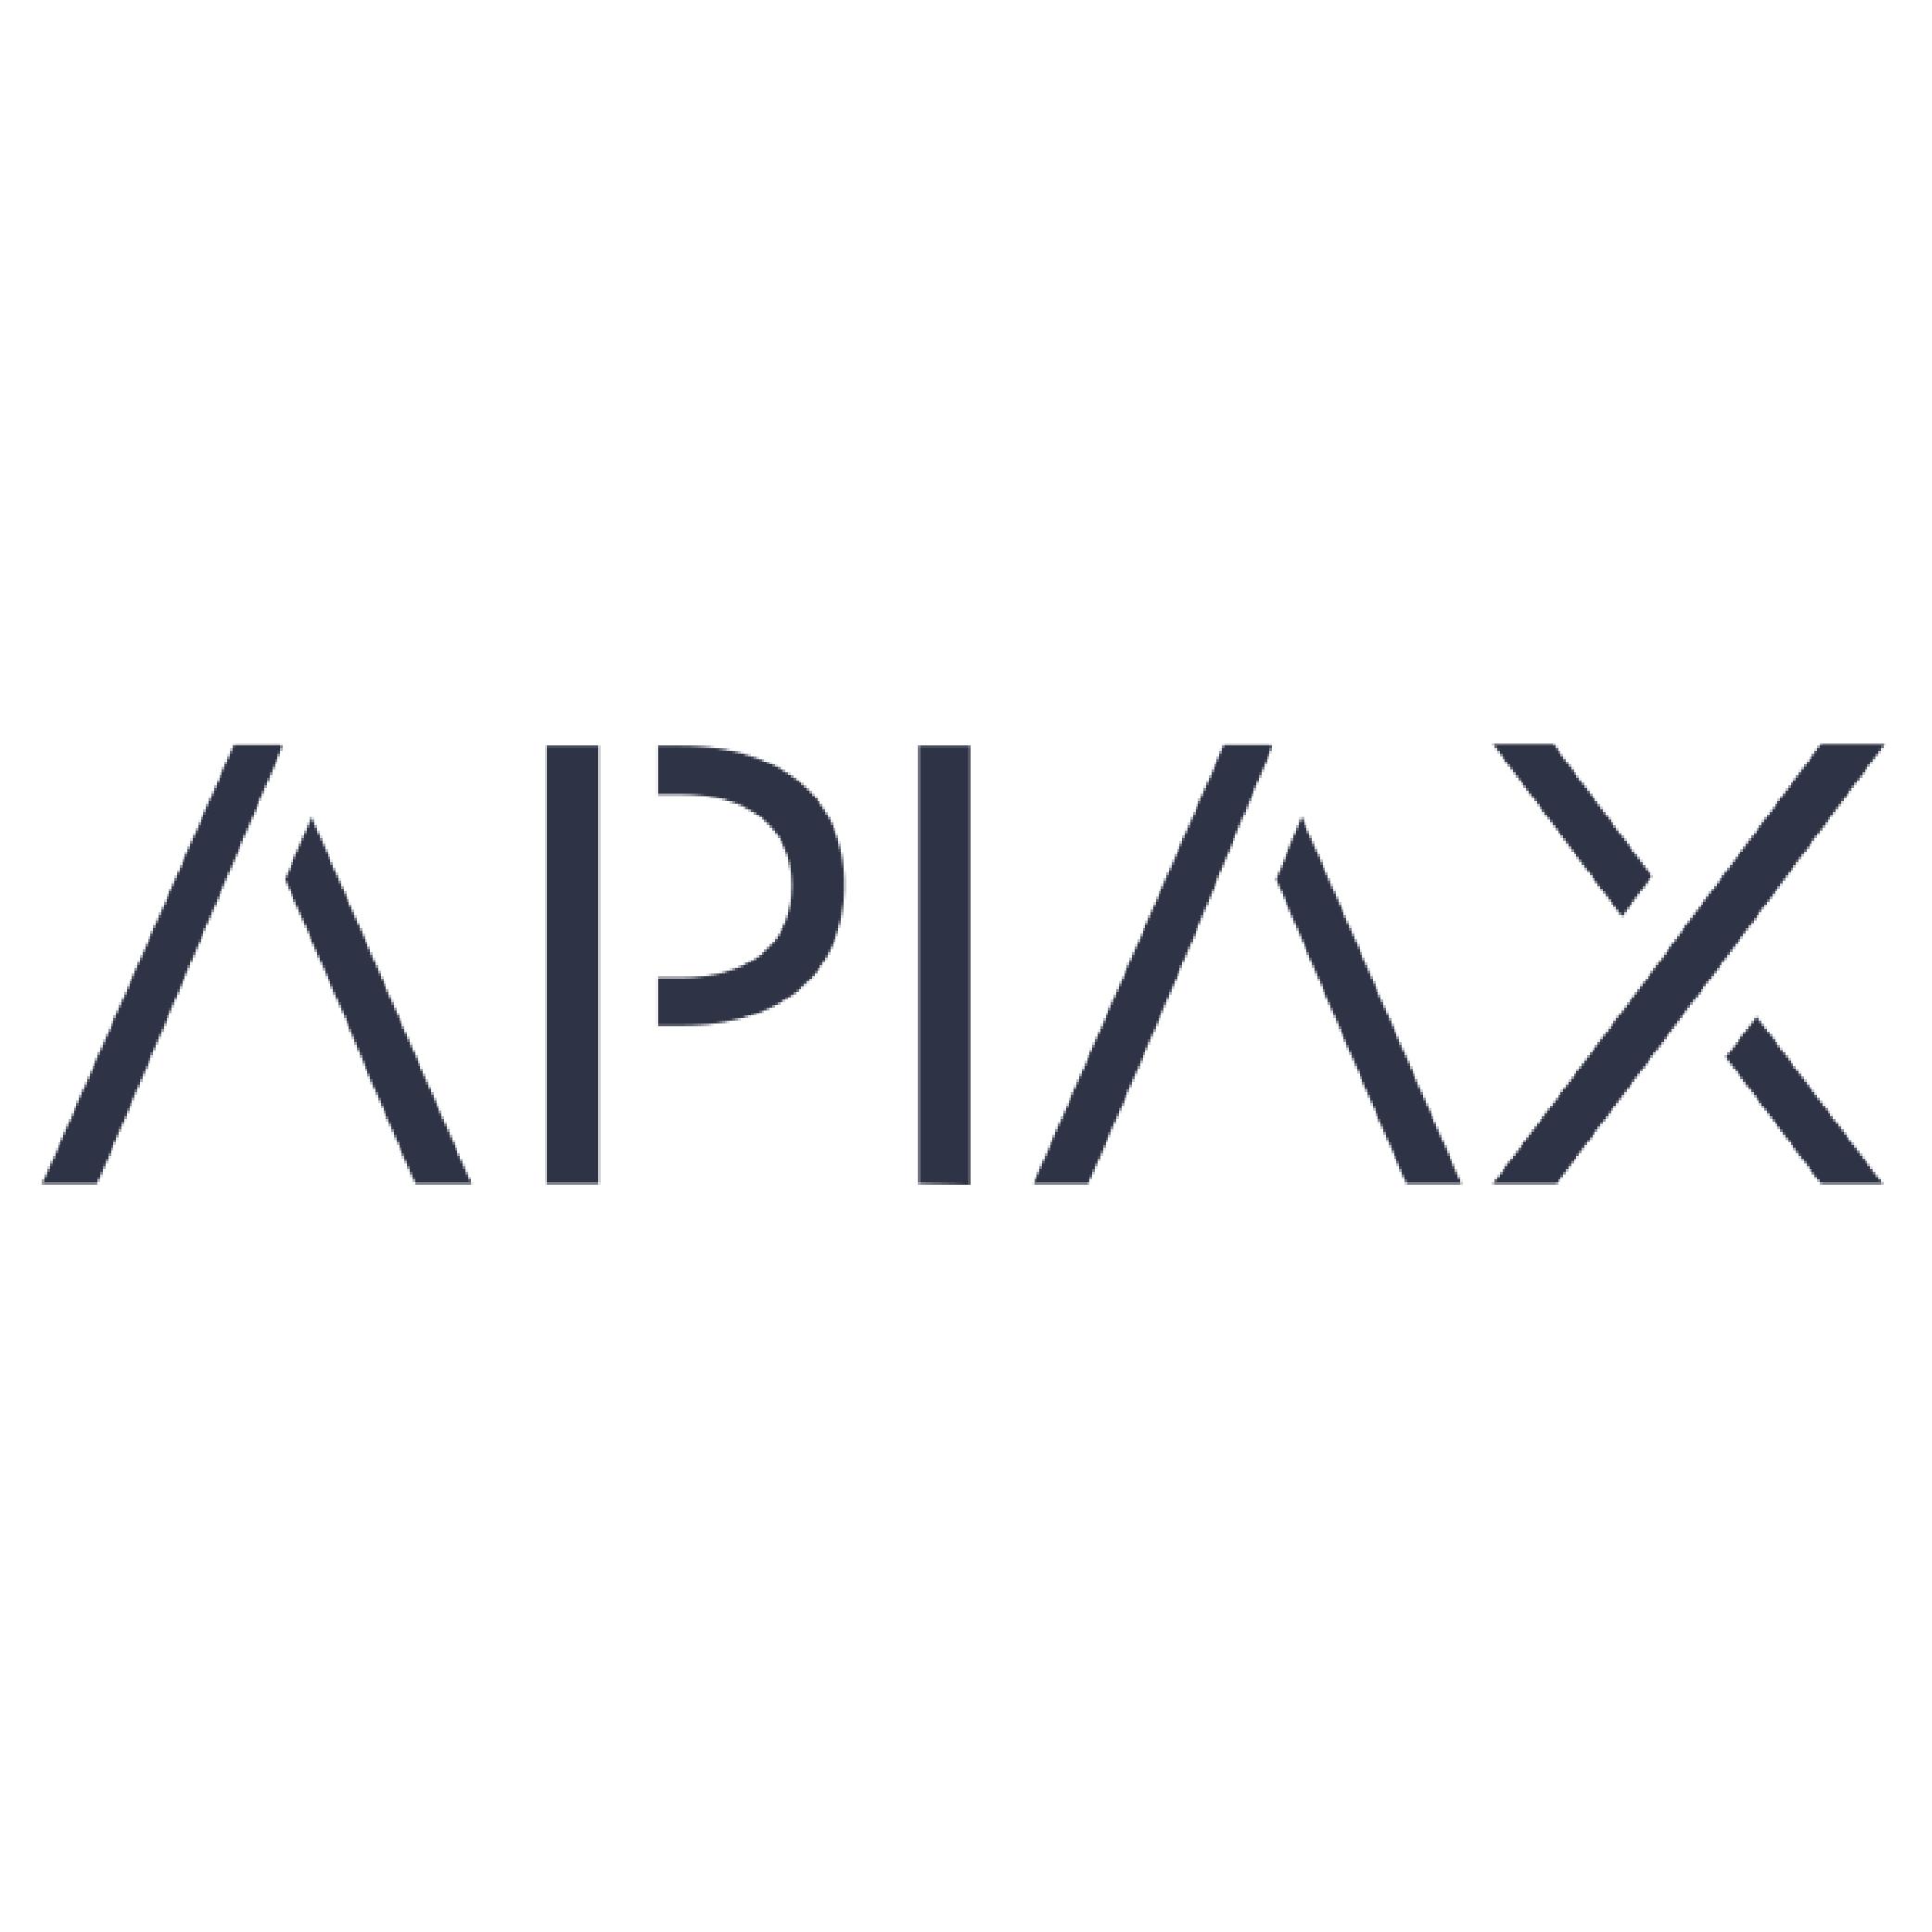 Apiax